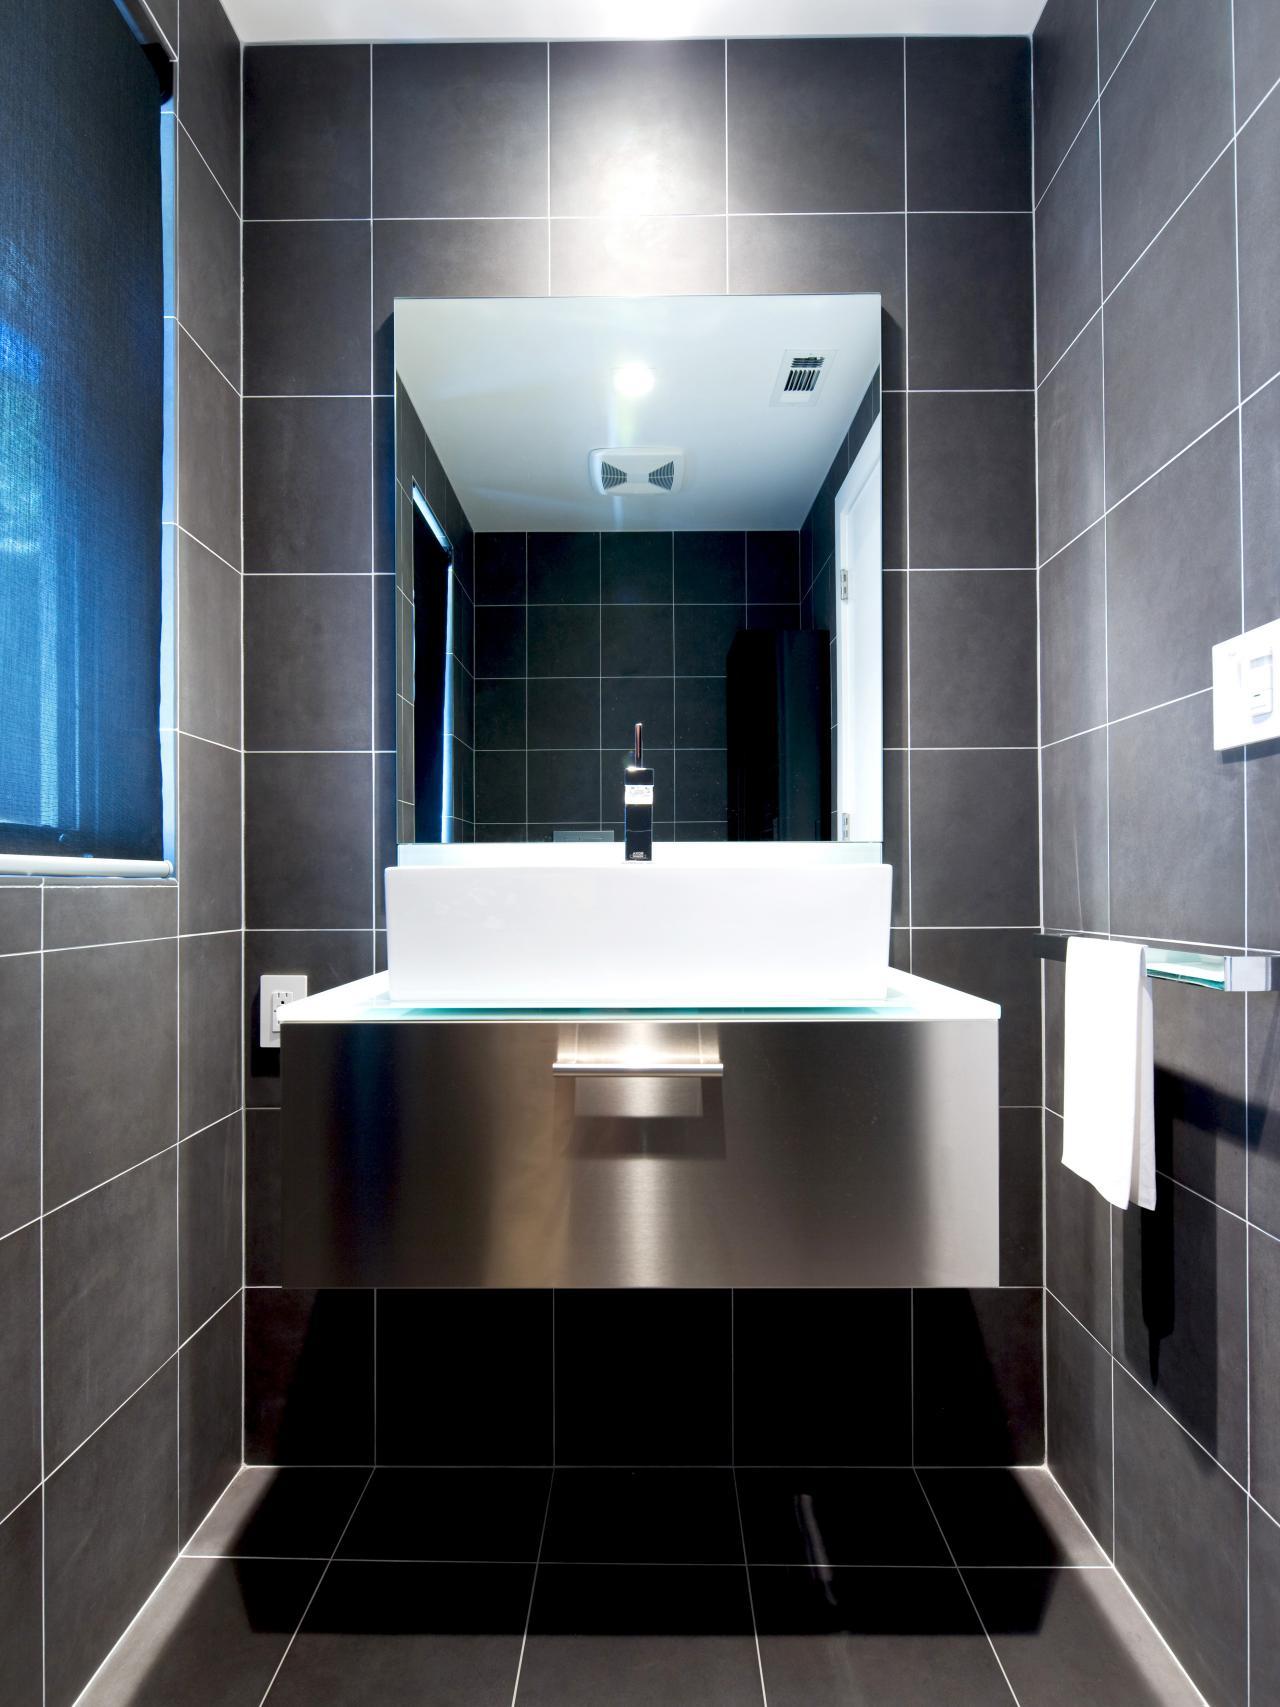 Original_Bathroom-Tile-Kriste-Michelini-Black-Tiled-Floors-Walls_s3x4.jpg.rend.hgtvcom.1280.1707